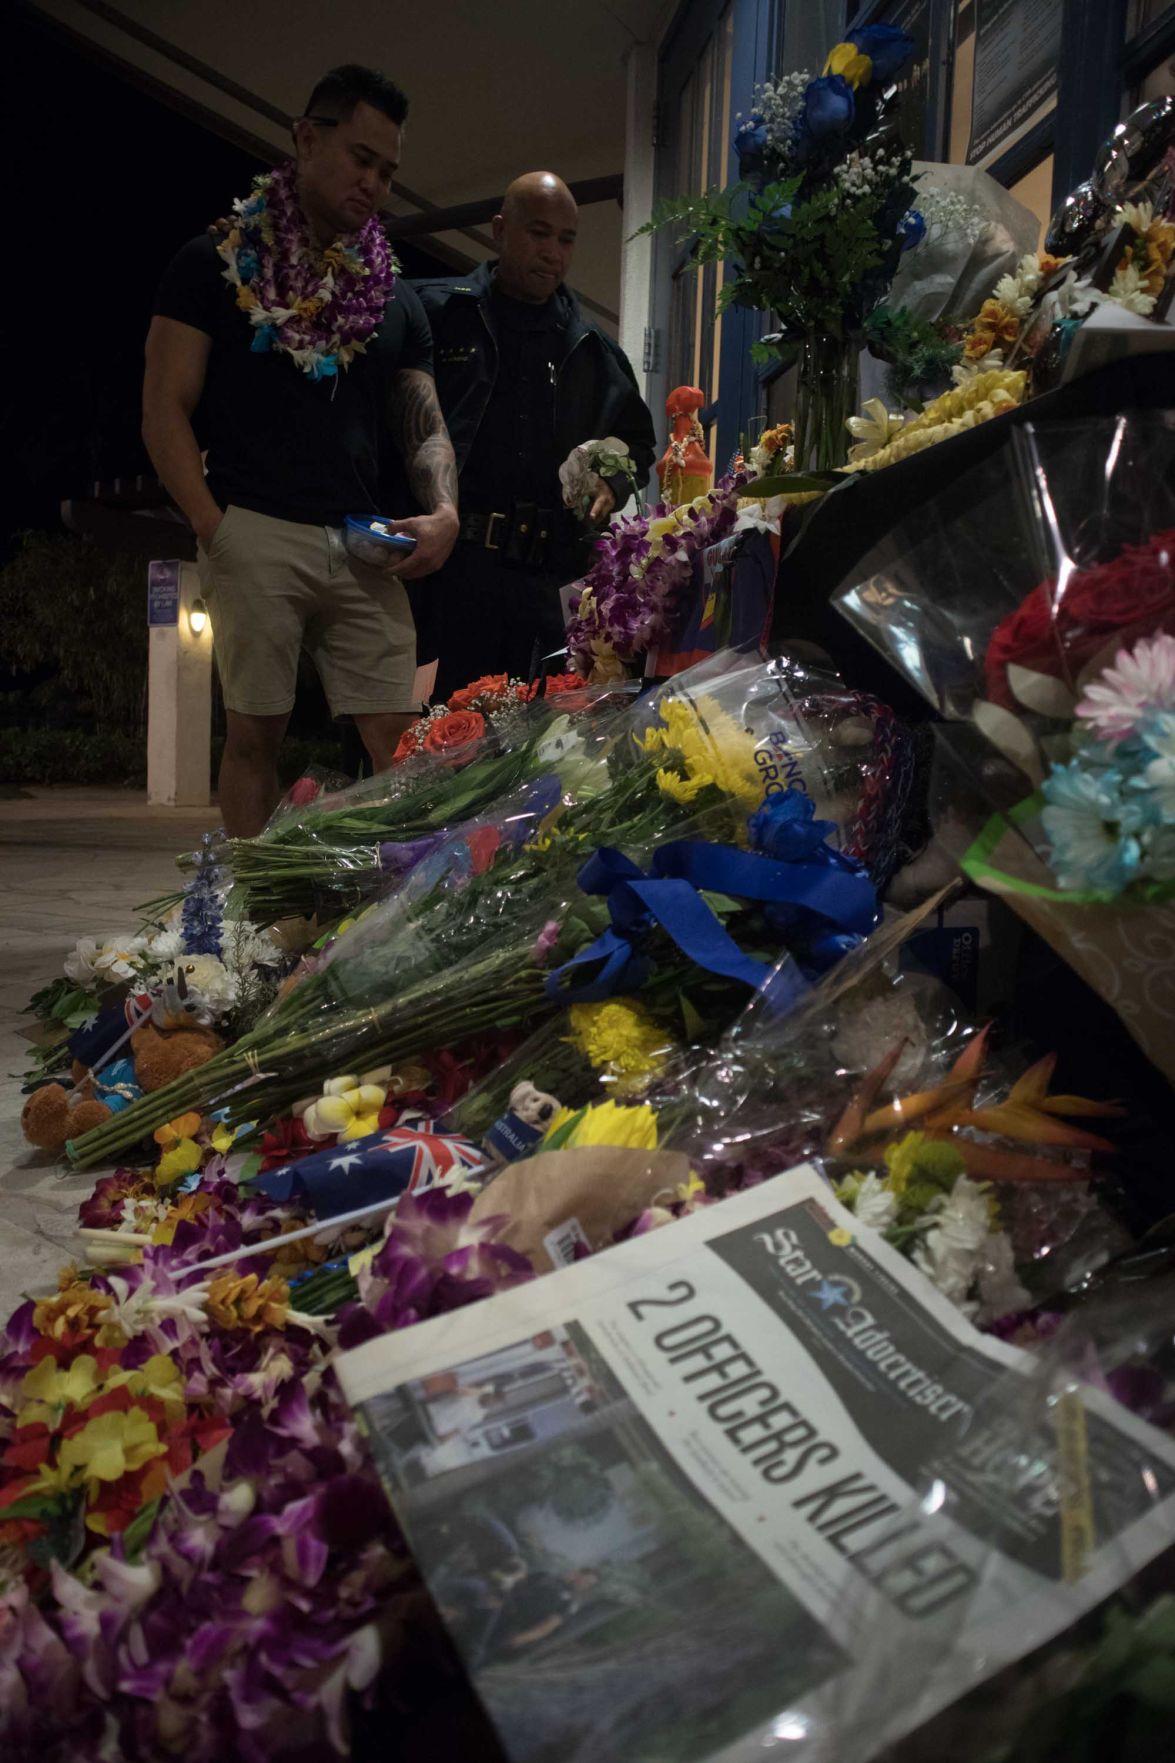 Jonathan Daniel Baba overlooking memorial for his girlfriend officer Tiffany Enriquez